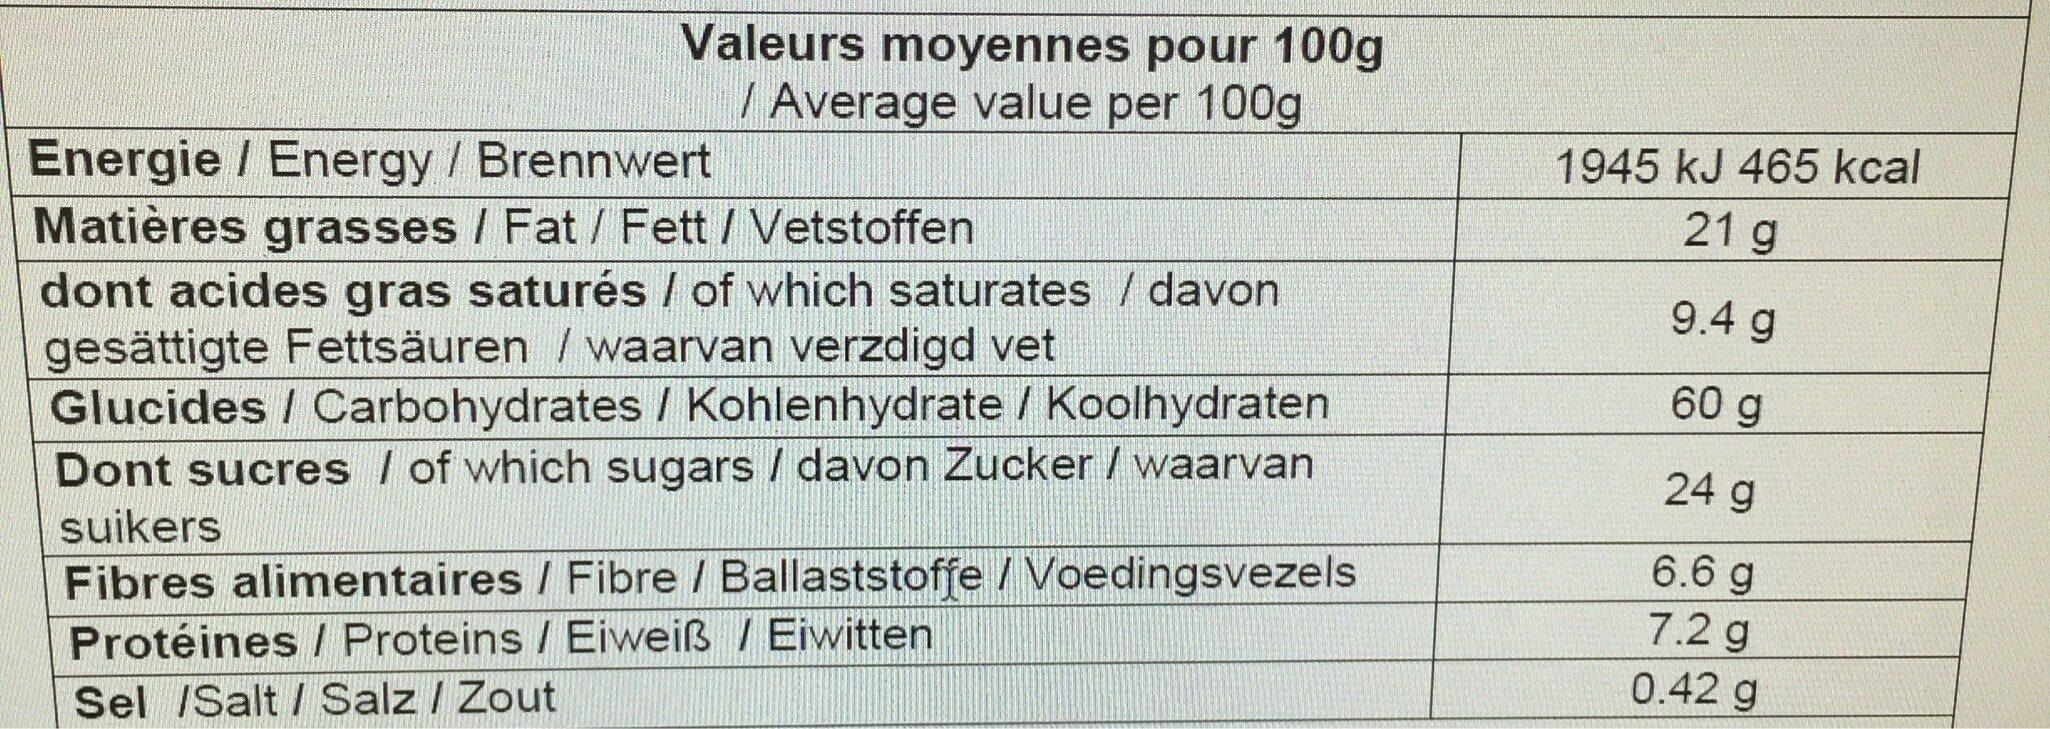 Essai framboise - Nutrition facts - fr